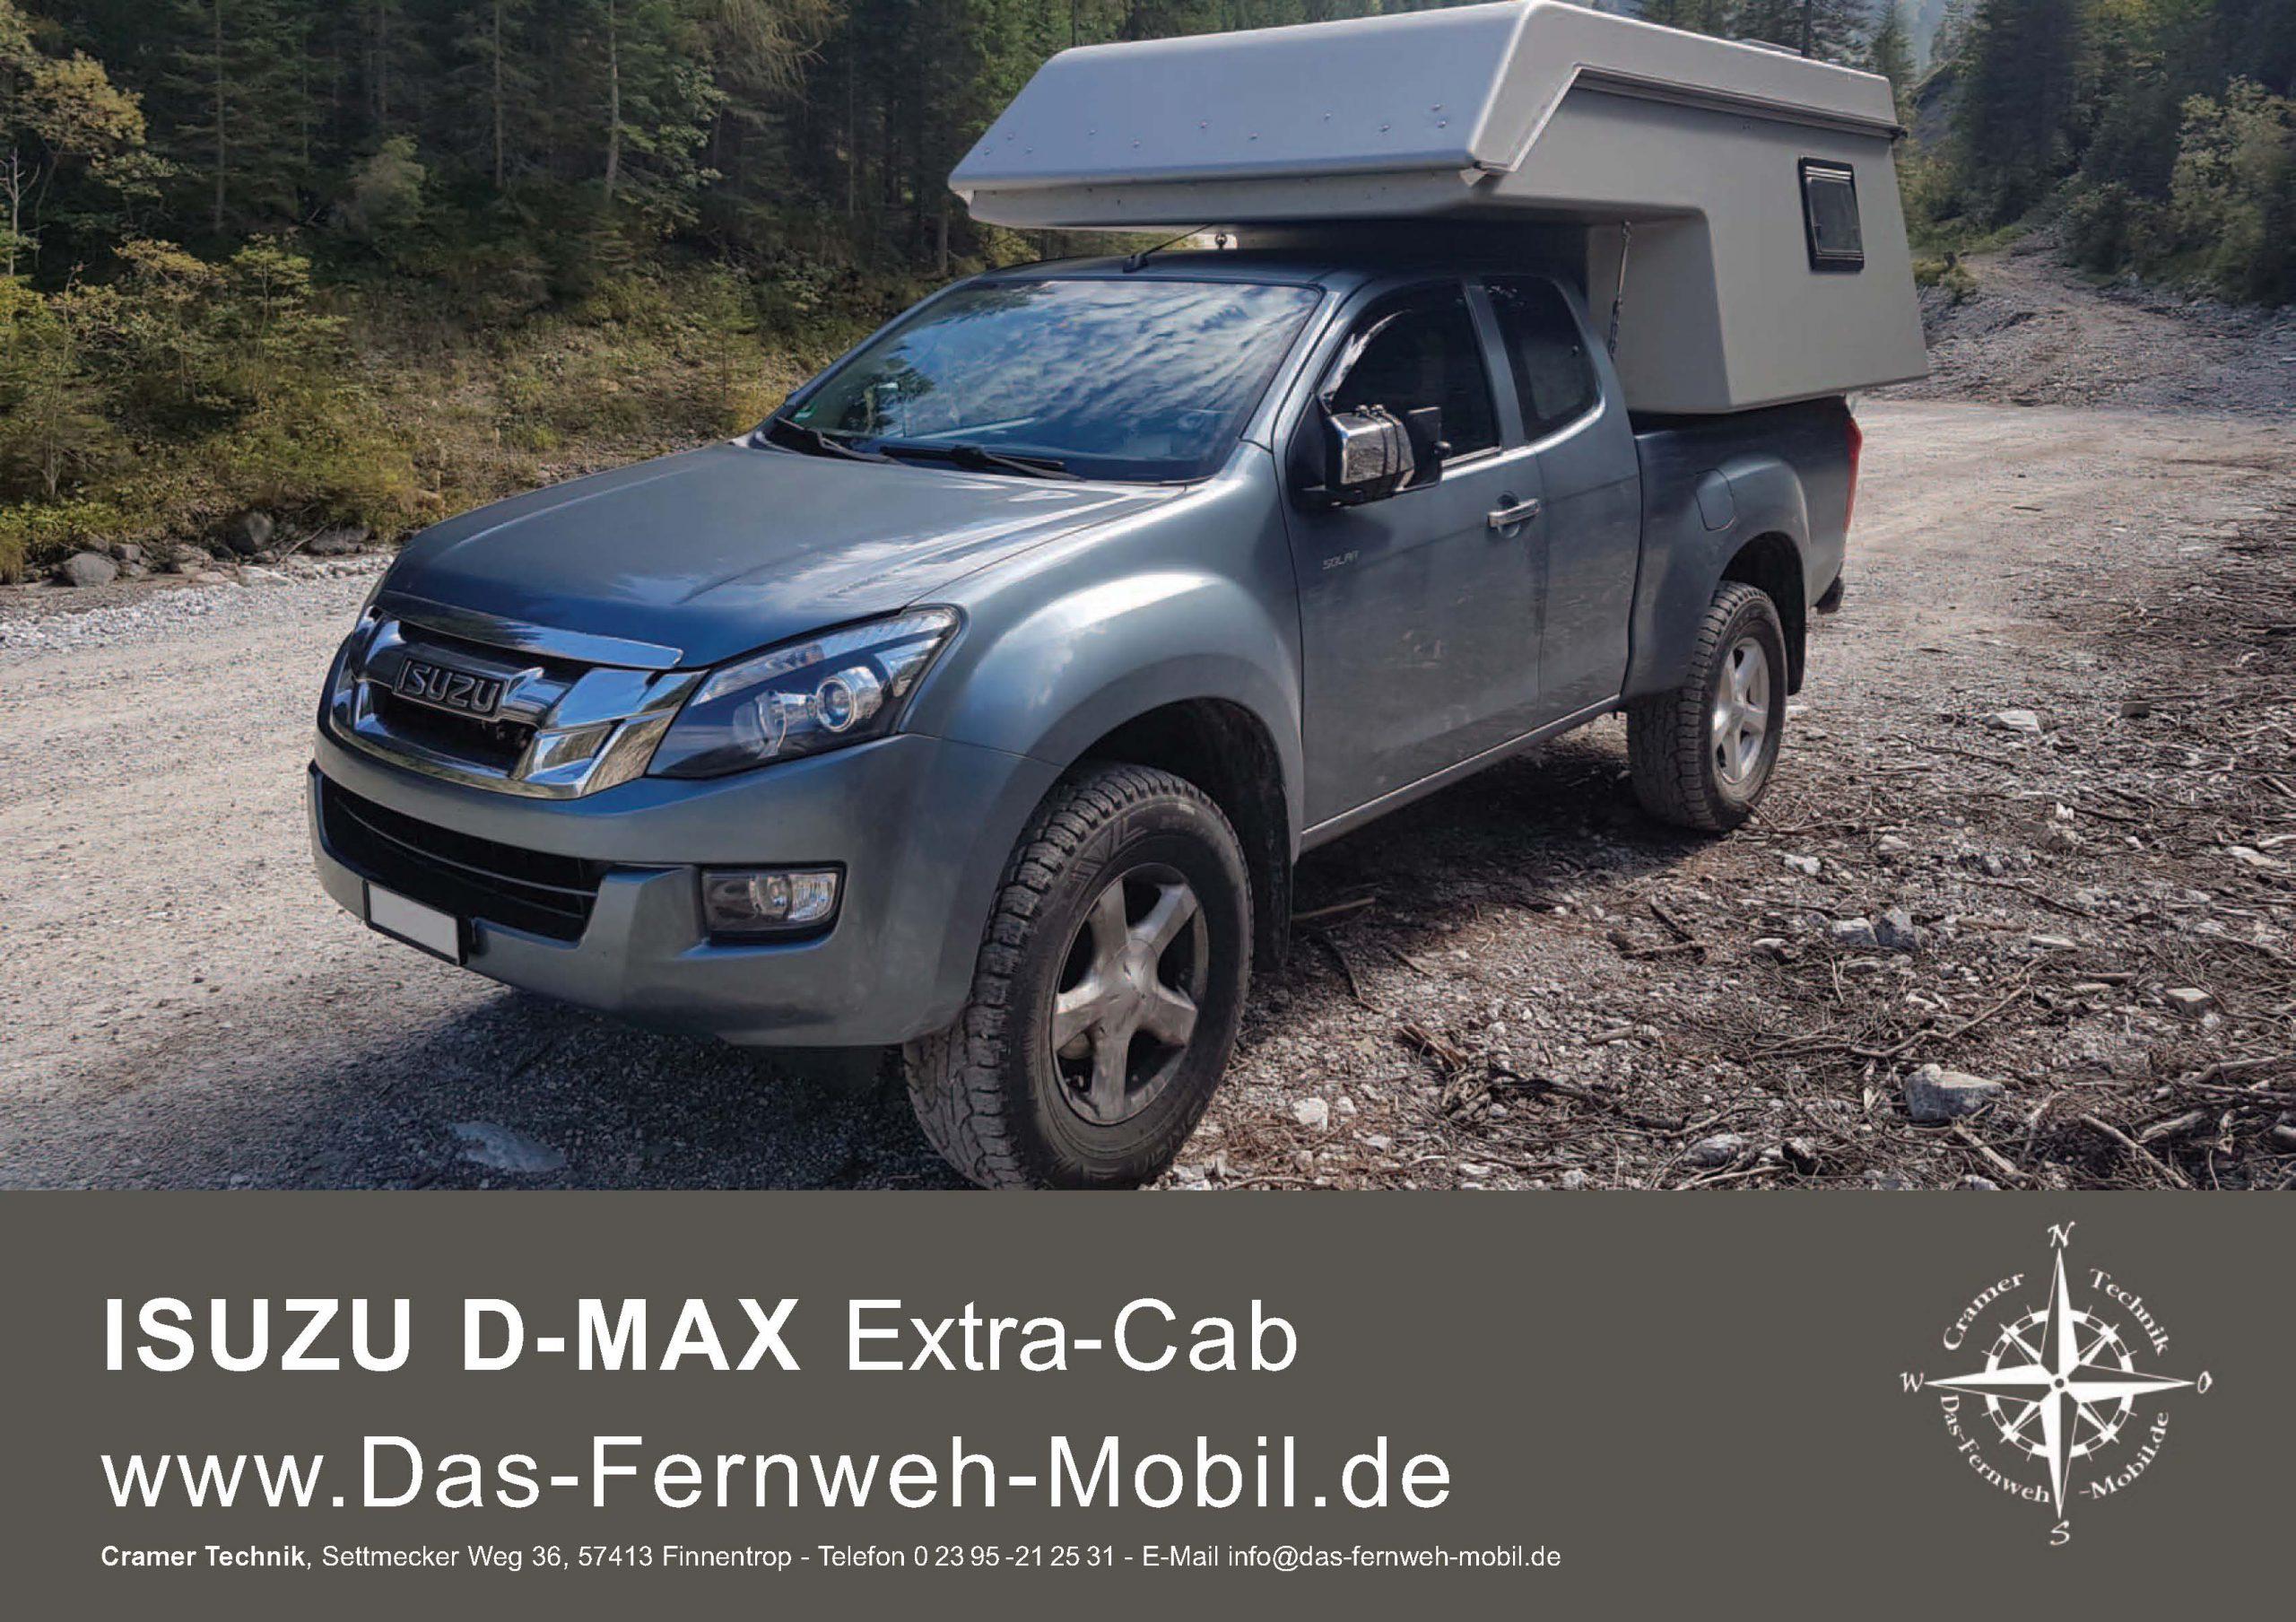 Datenblatt-Isuzu-D-Max-Extra-Cab-102019-k_Seite_1